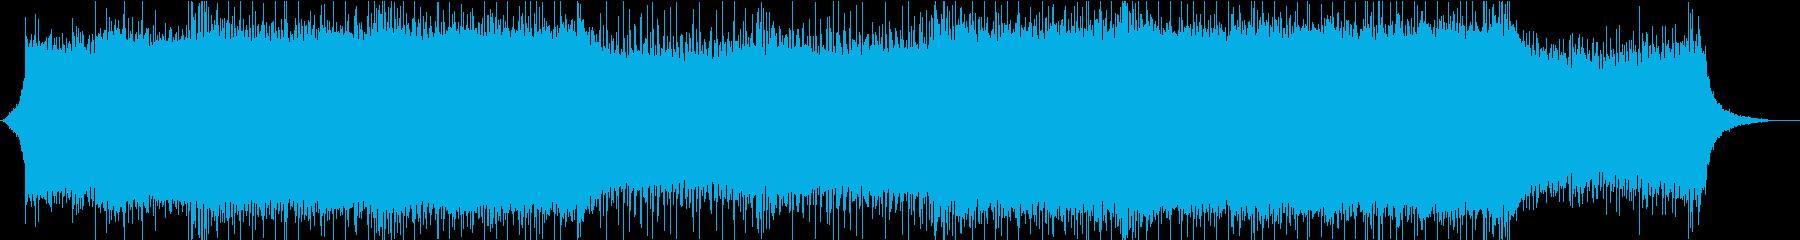 EDM、エレクトロ、シンセ、ノリノリの再生済みの波形